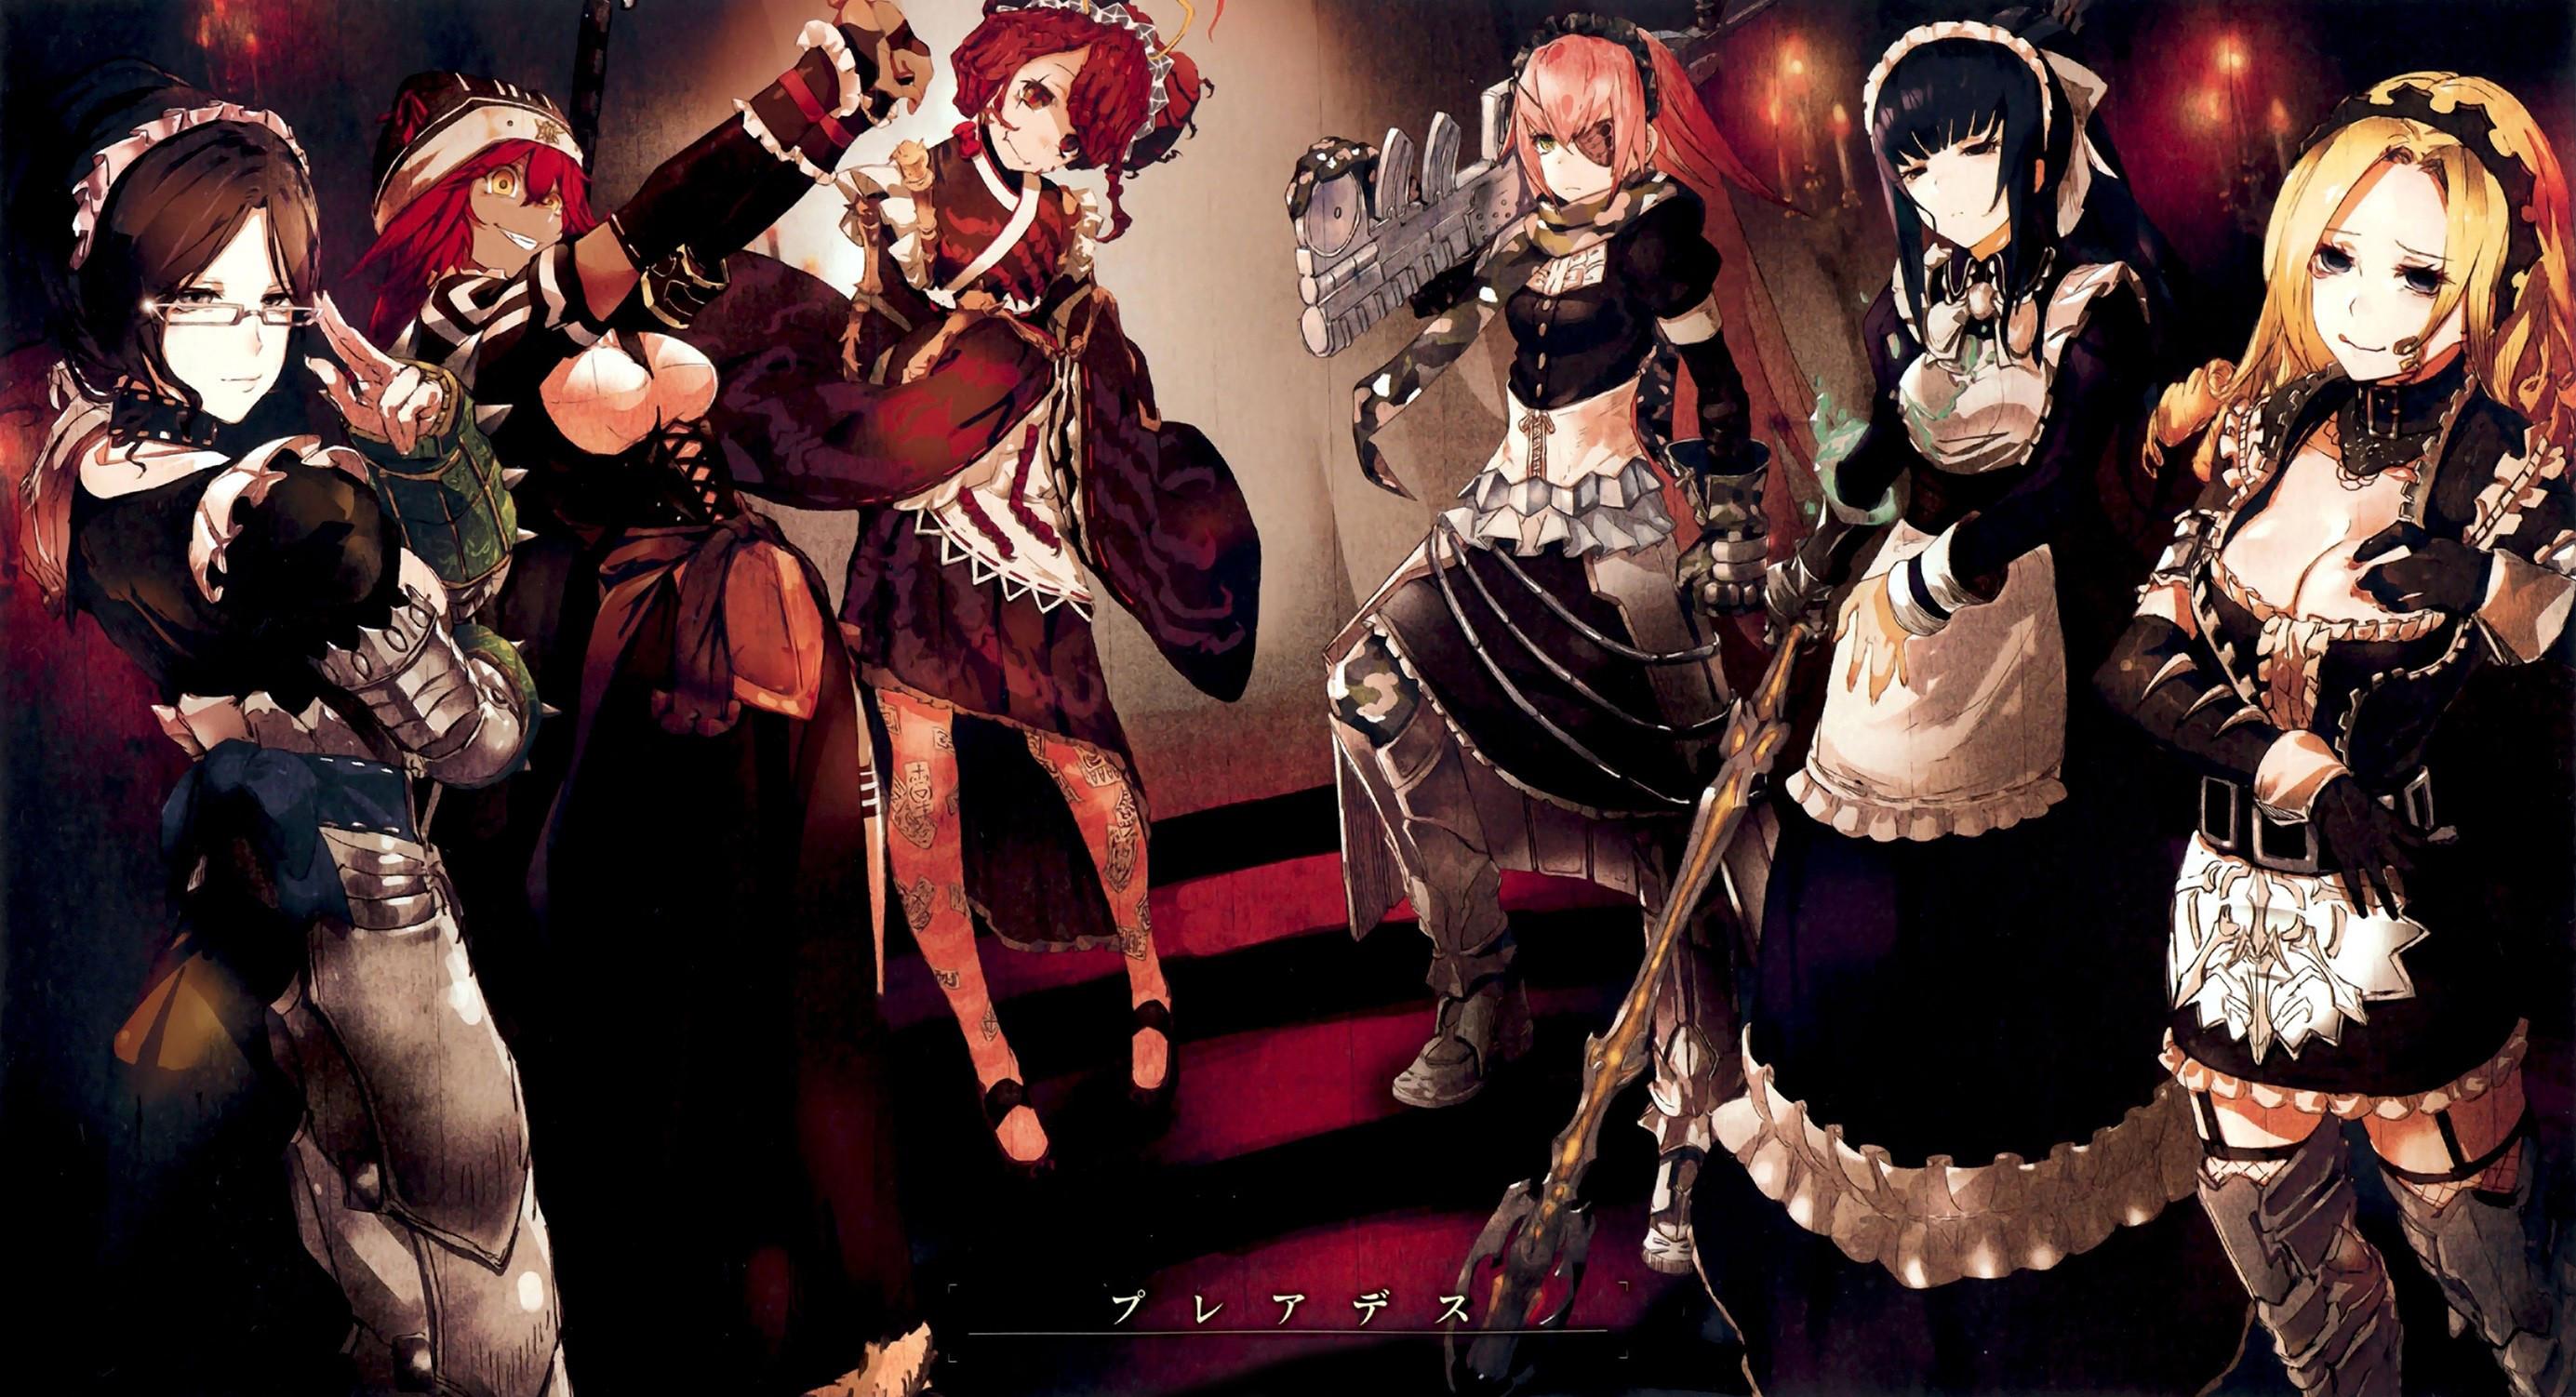 Res: 2769x1502, Anime - Overlord Entoma Vasilissa Zeta CZ2128 Delta Narberal Gamma Yuri  Alpha Lupusregina Beta Pleiades (